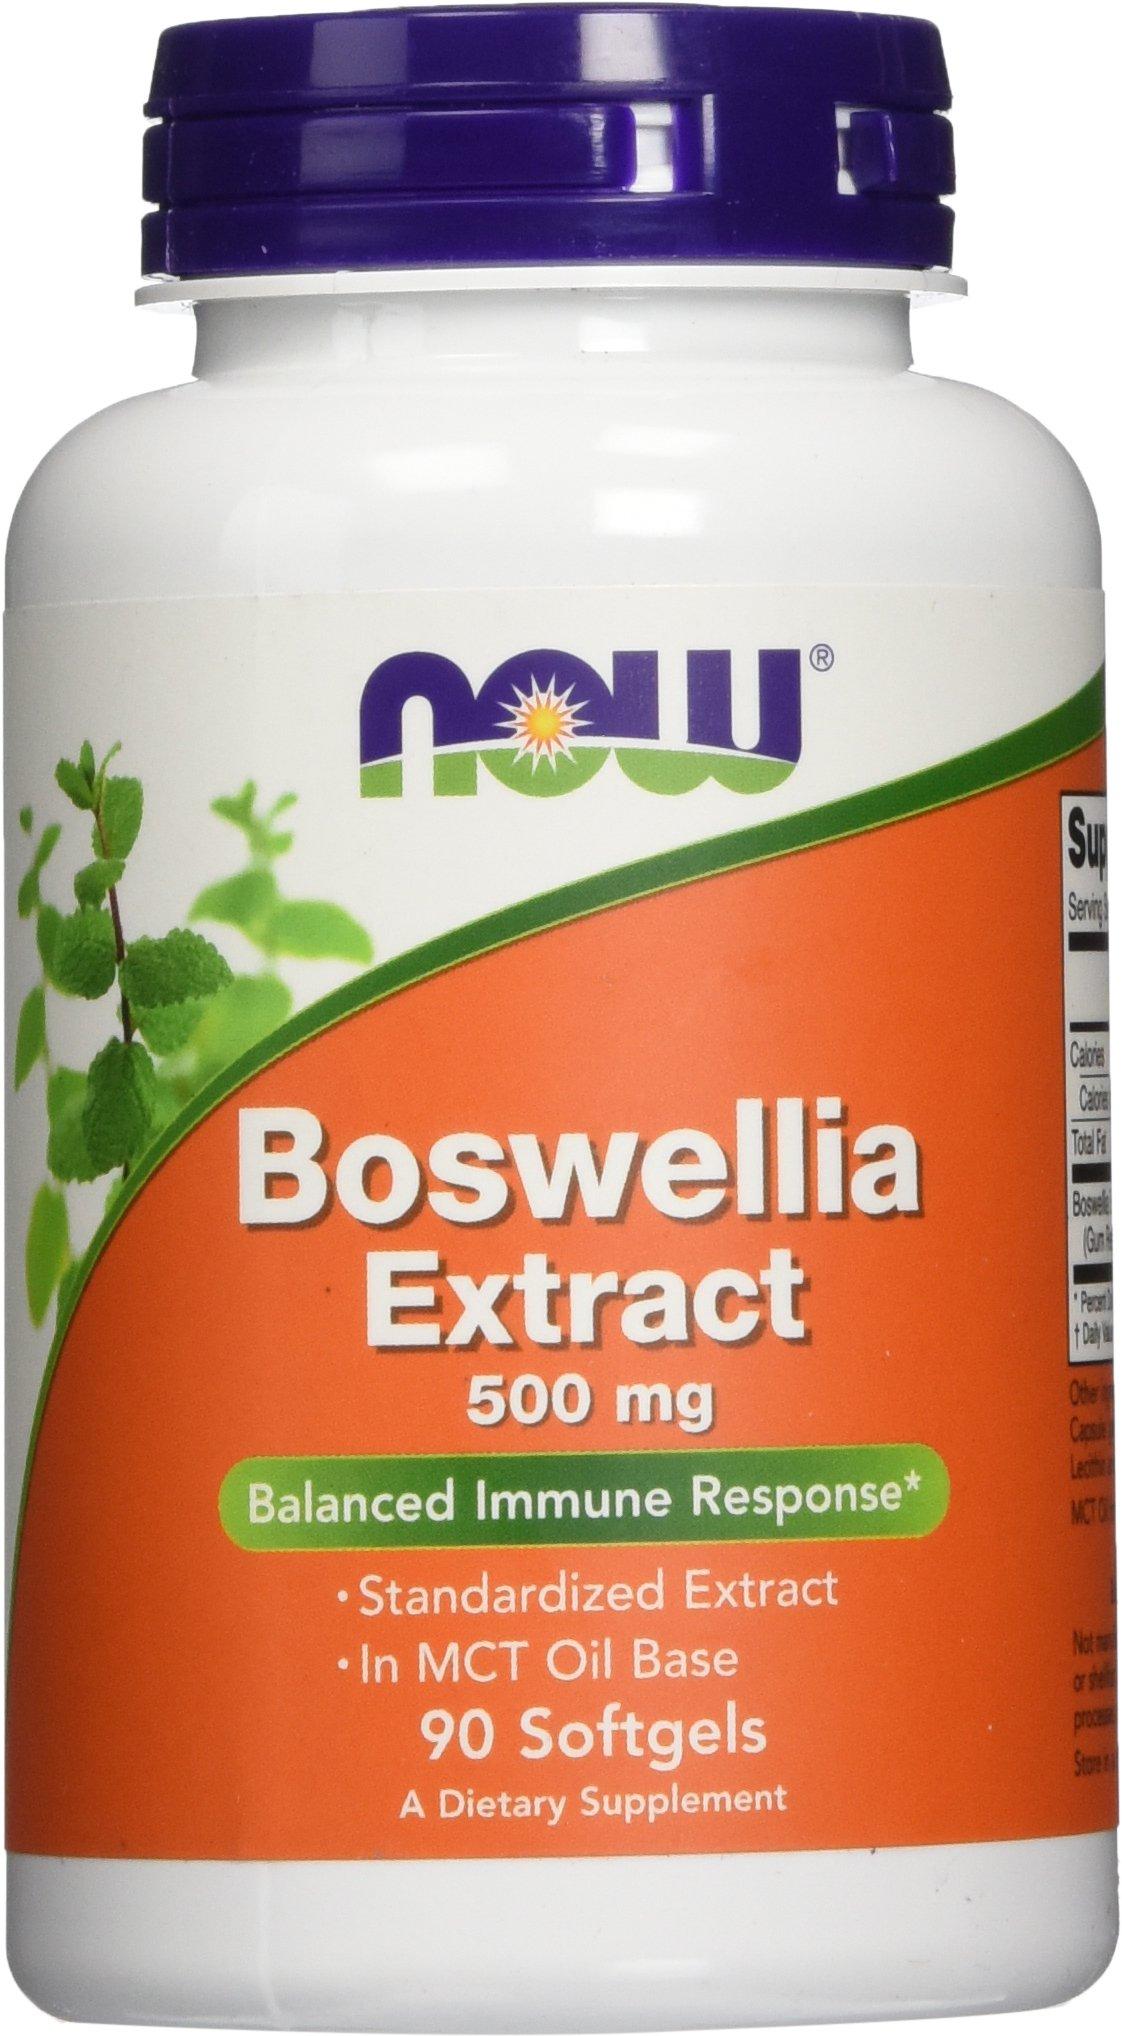 NOW Boswellia Extract 500 mg,90 Softgels